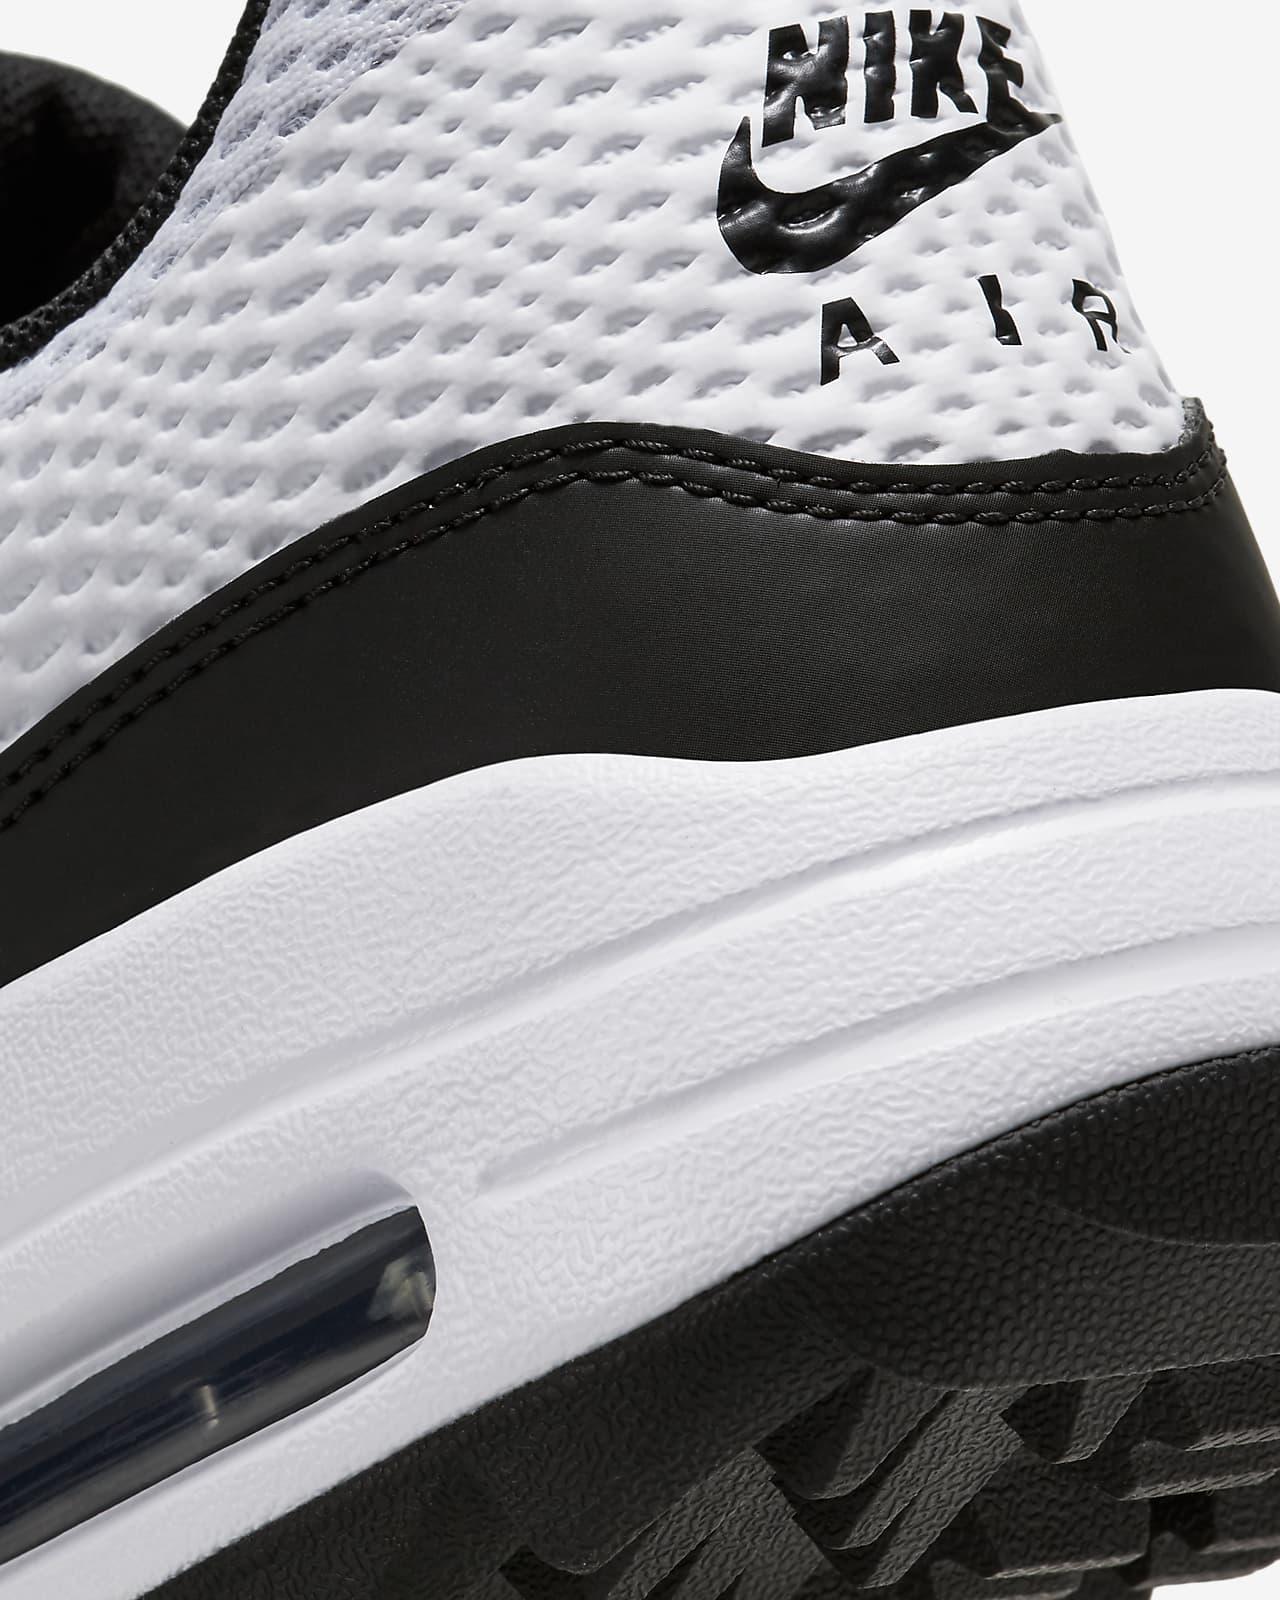 Nike Air Max 1 G Women's Golf Shoe. Nike BG